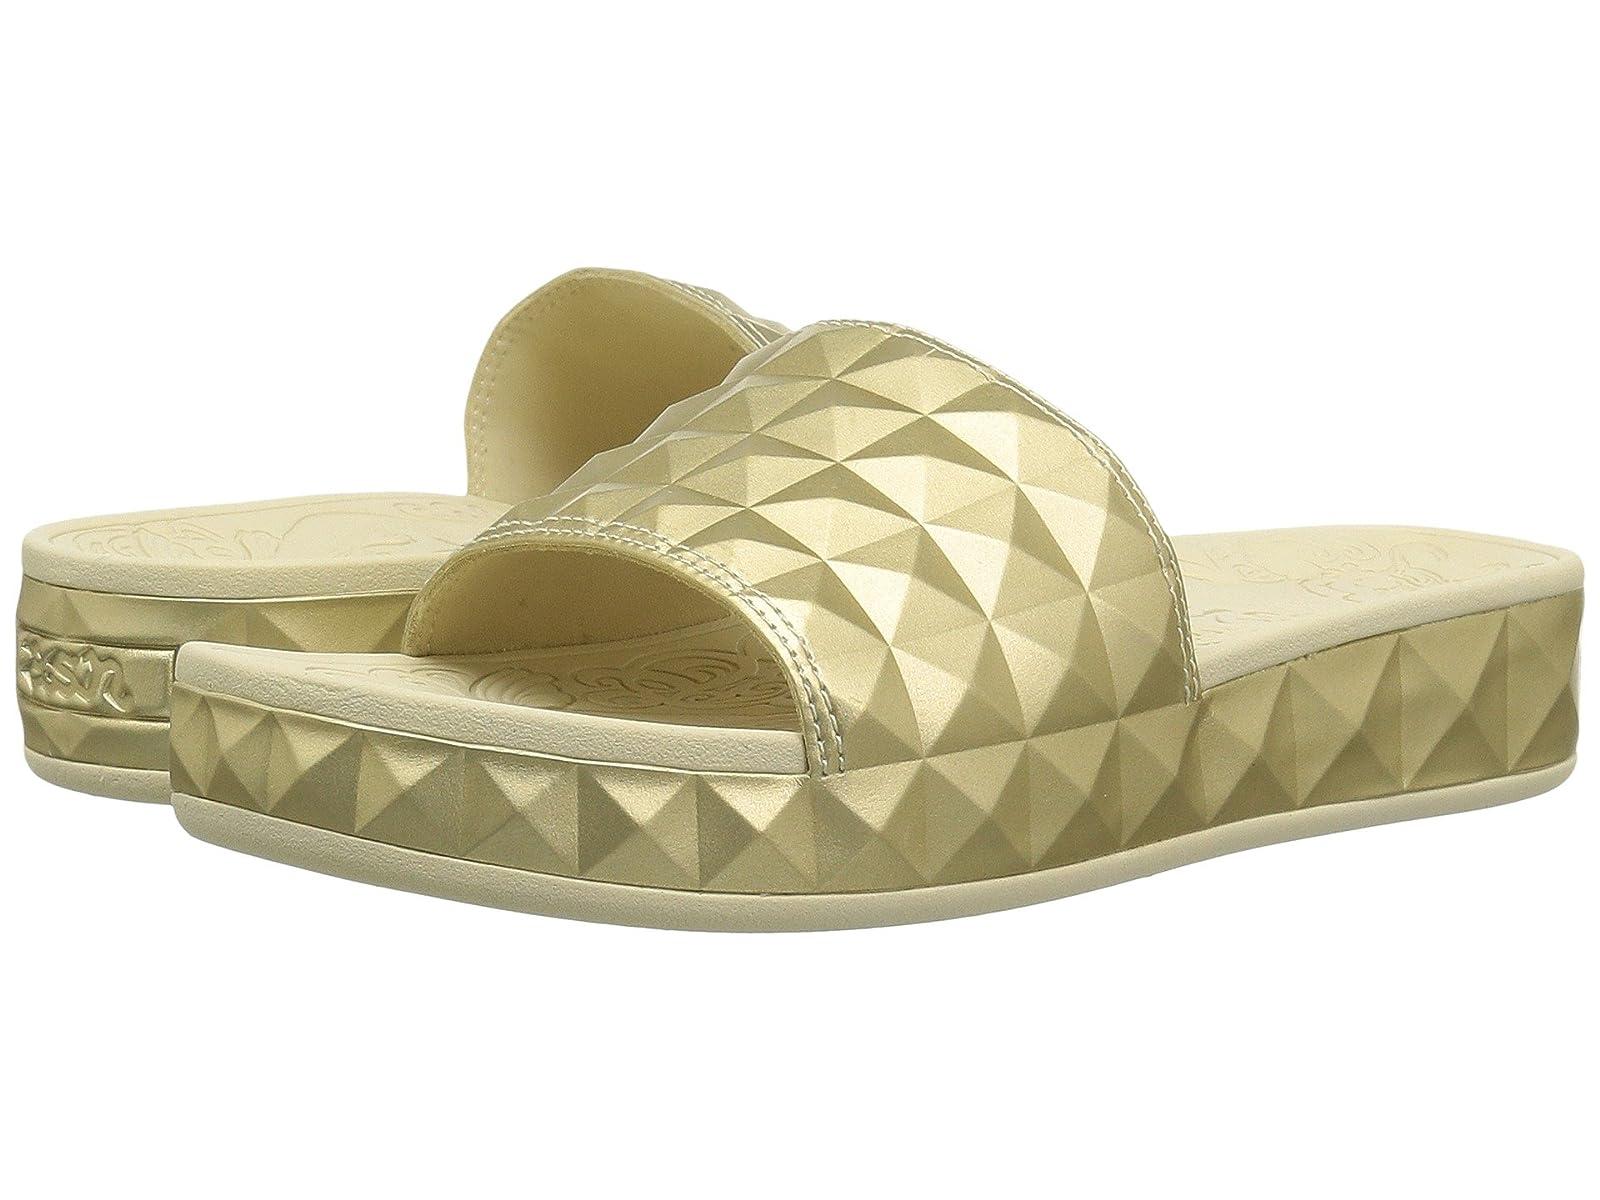 ASH SplashCheap and distinctive eye-catching shoes